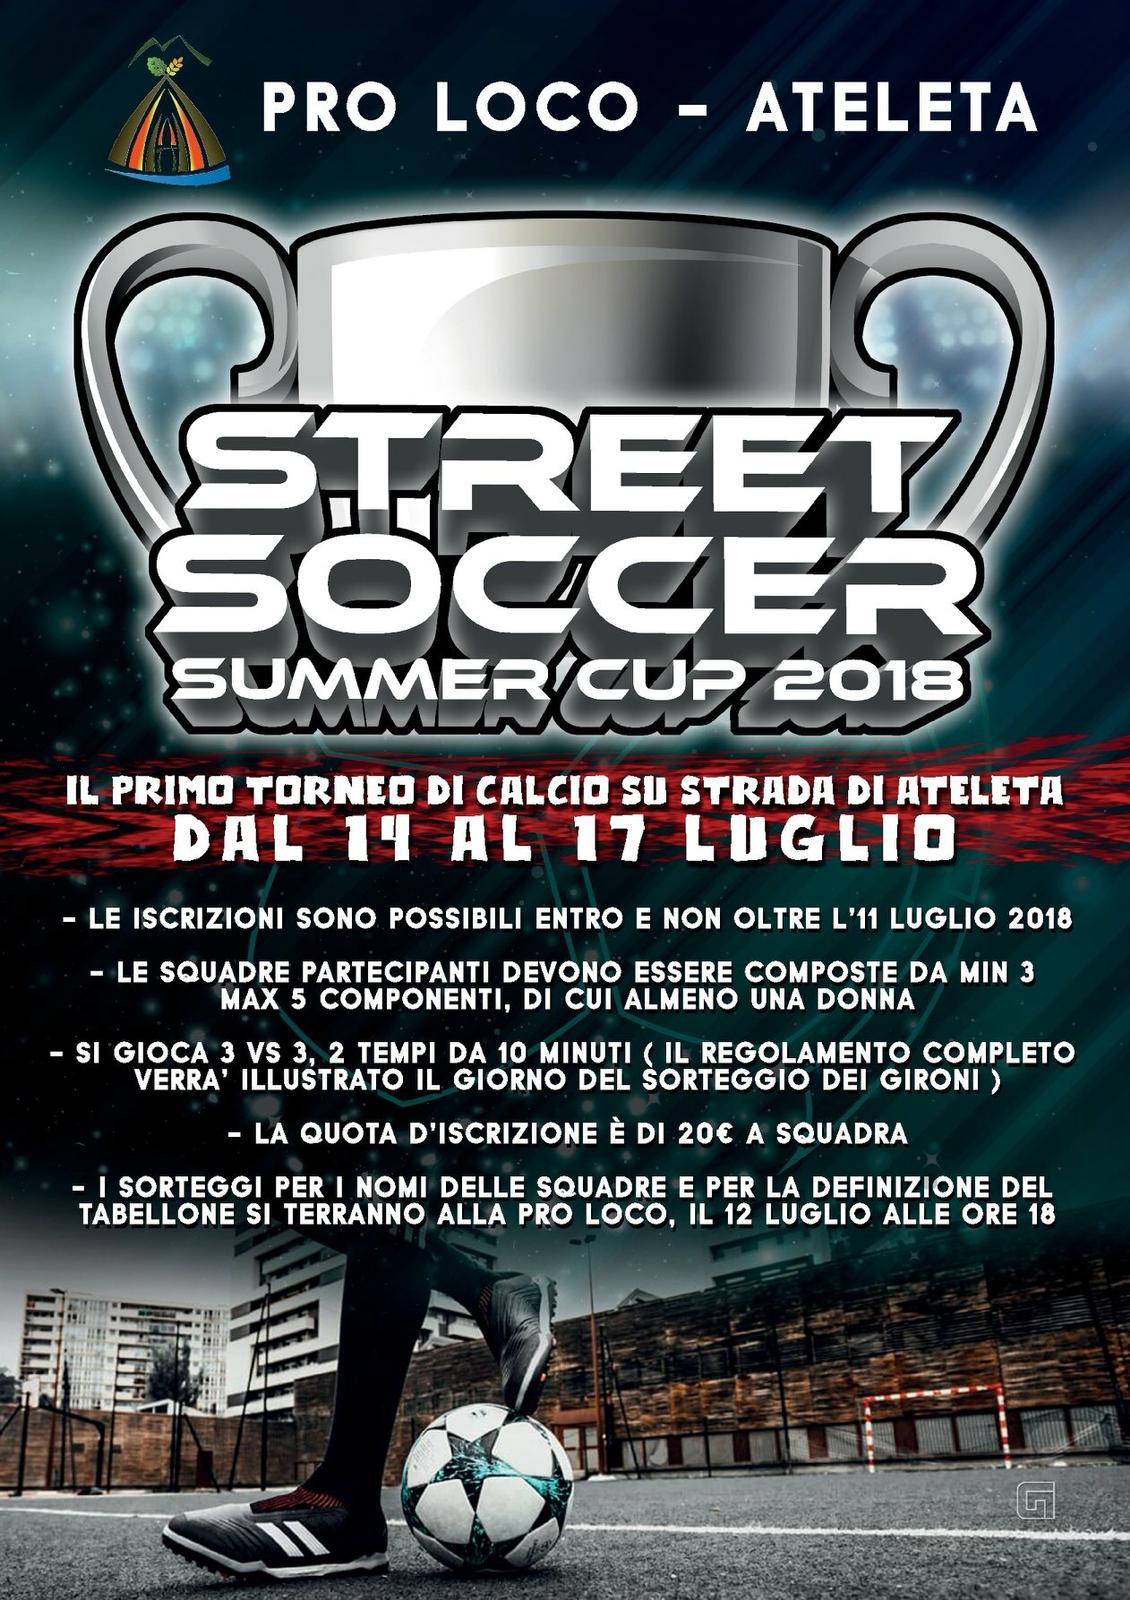 Street soccer summer cup 2018 Ateleta